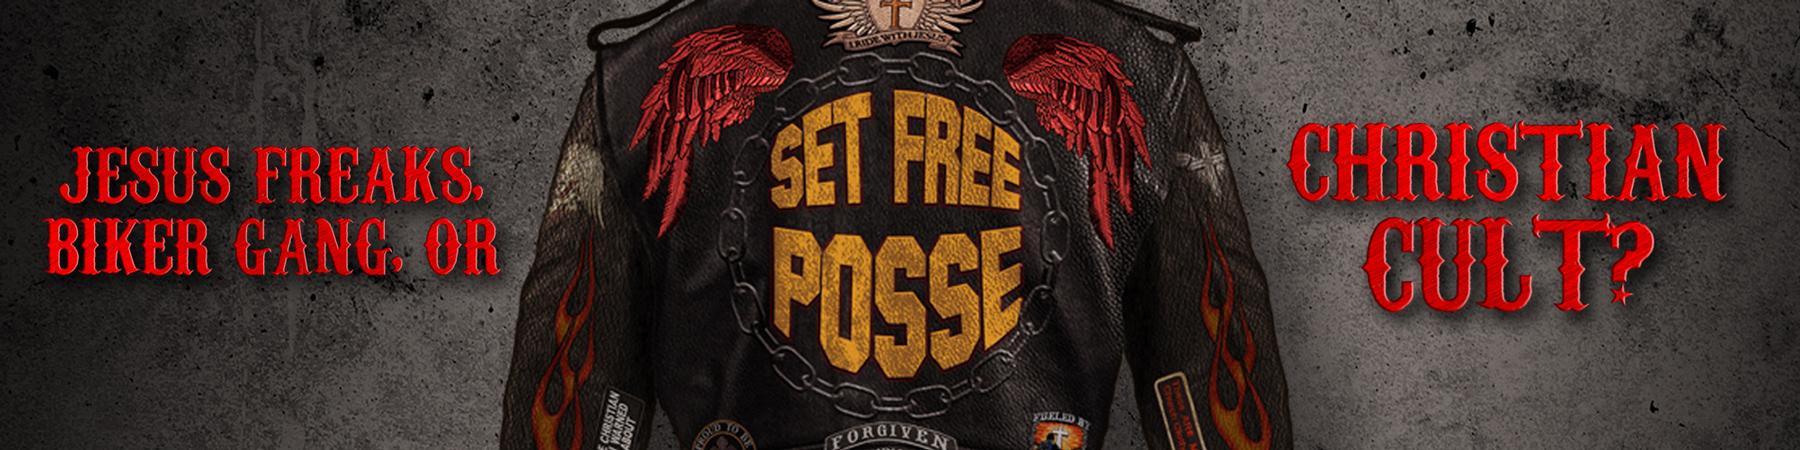 Set-Free-Posse_banner